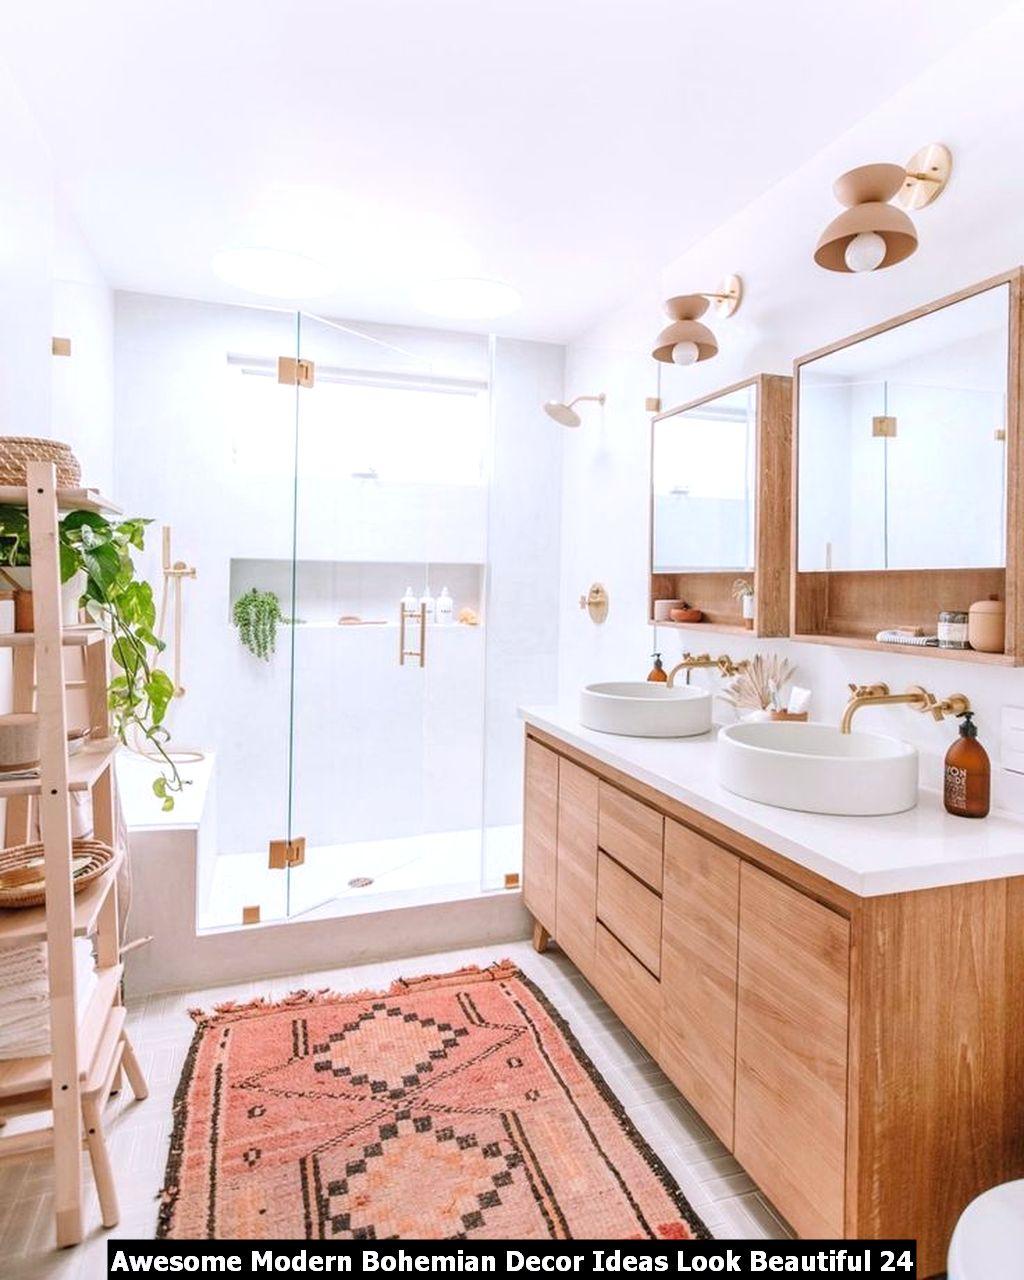 Awesome Modern Bohemian Decor Ideas Look Beautiful 24